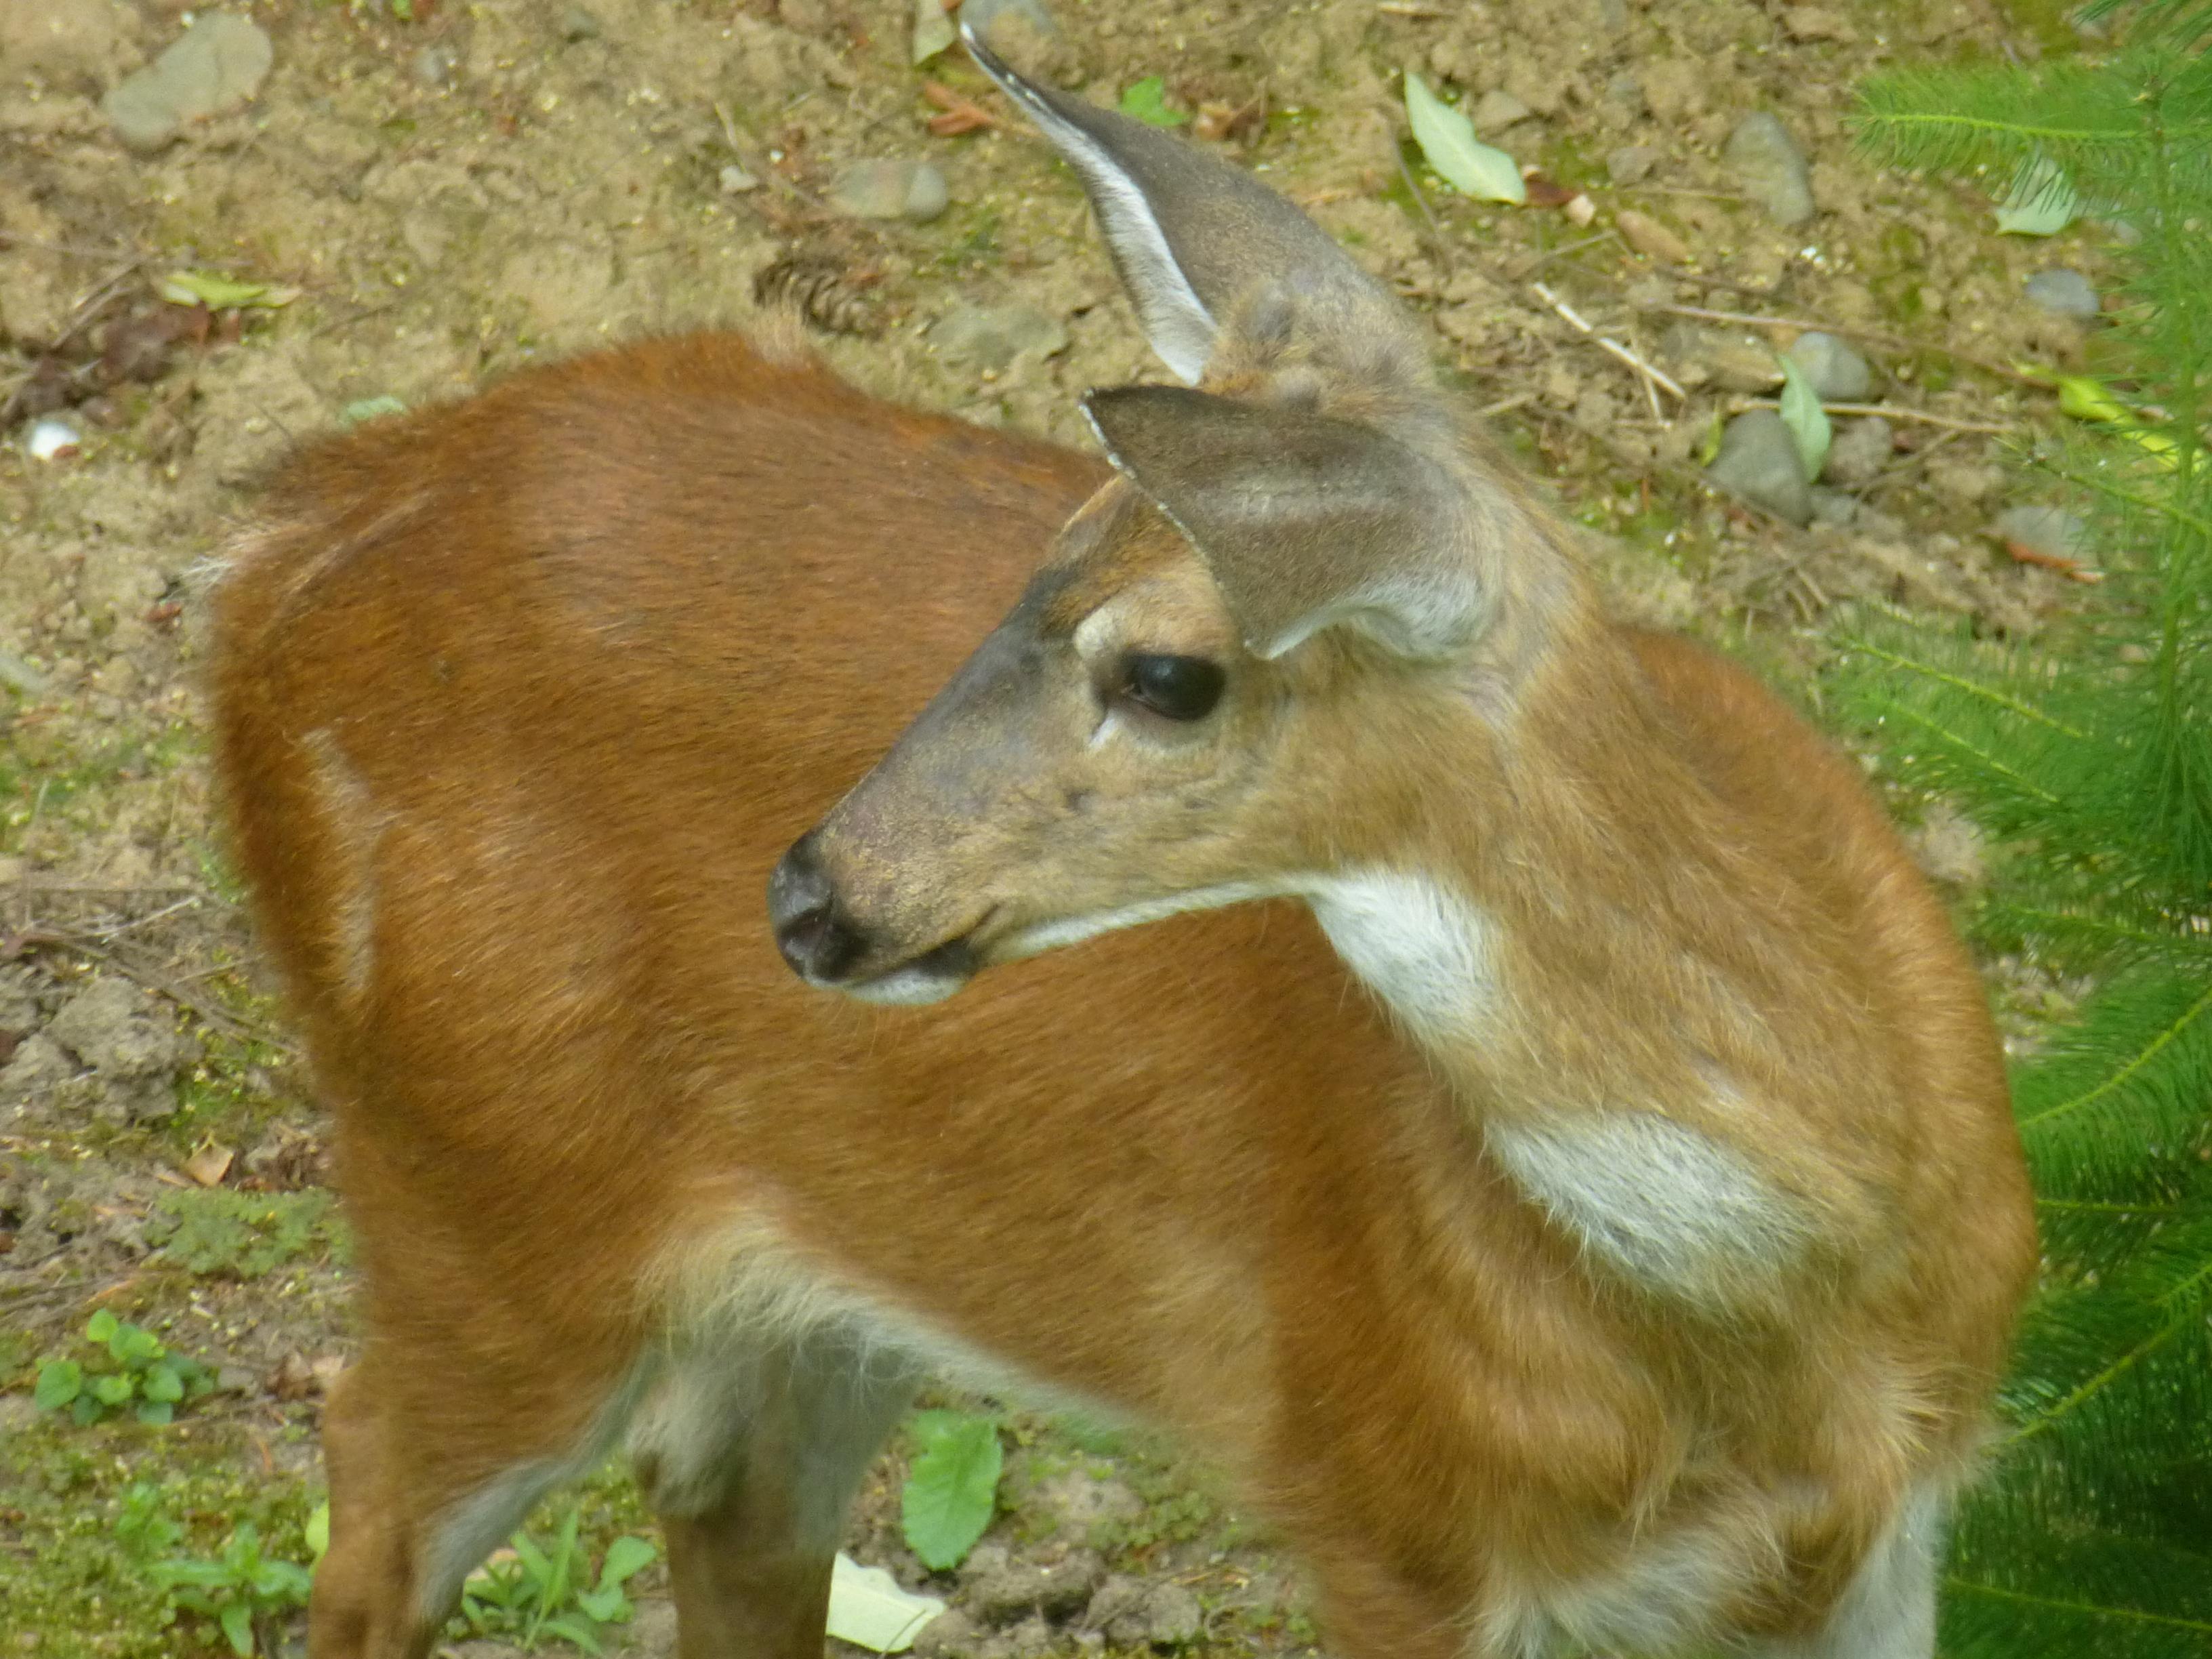 behrens wildlife madagascar barnes dp books com guides keith of amazon explorer ken control barns